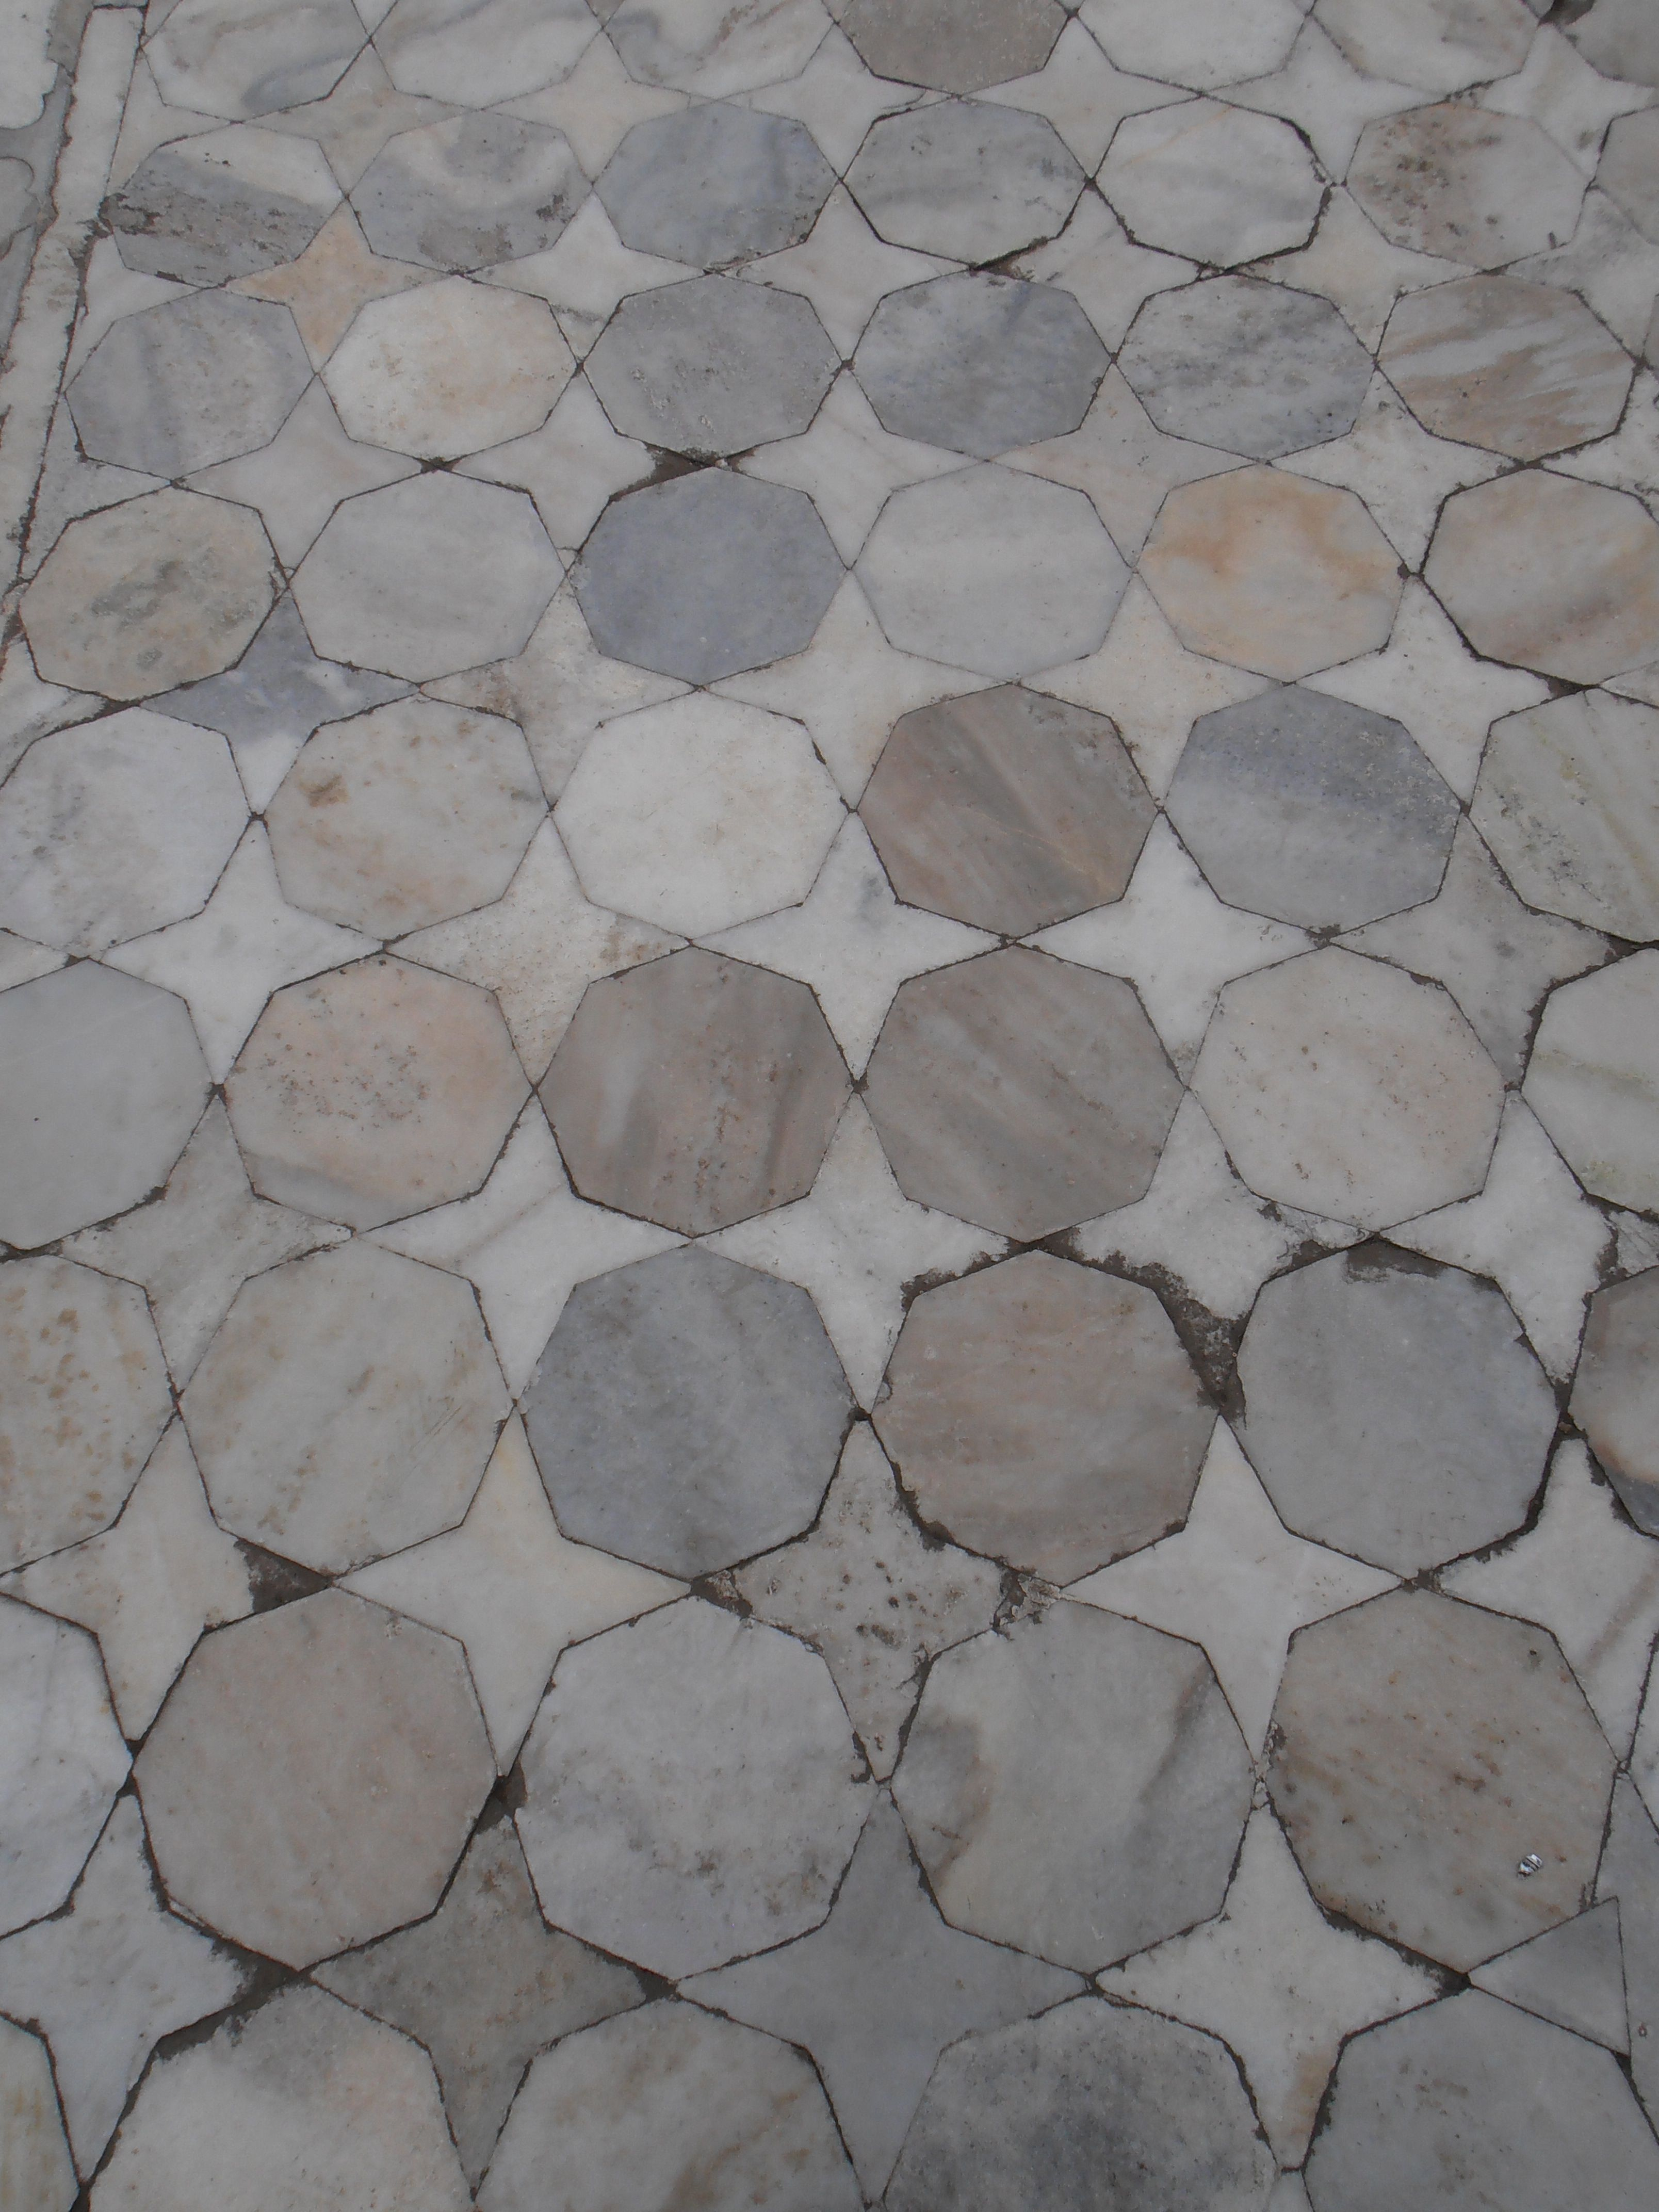 Marble Floor Agra Fort Uttar Pradesh India In 2019 India